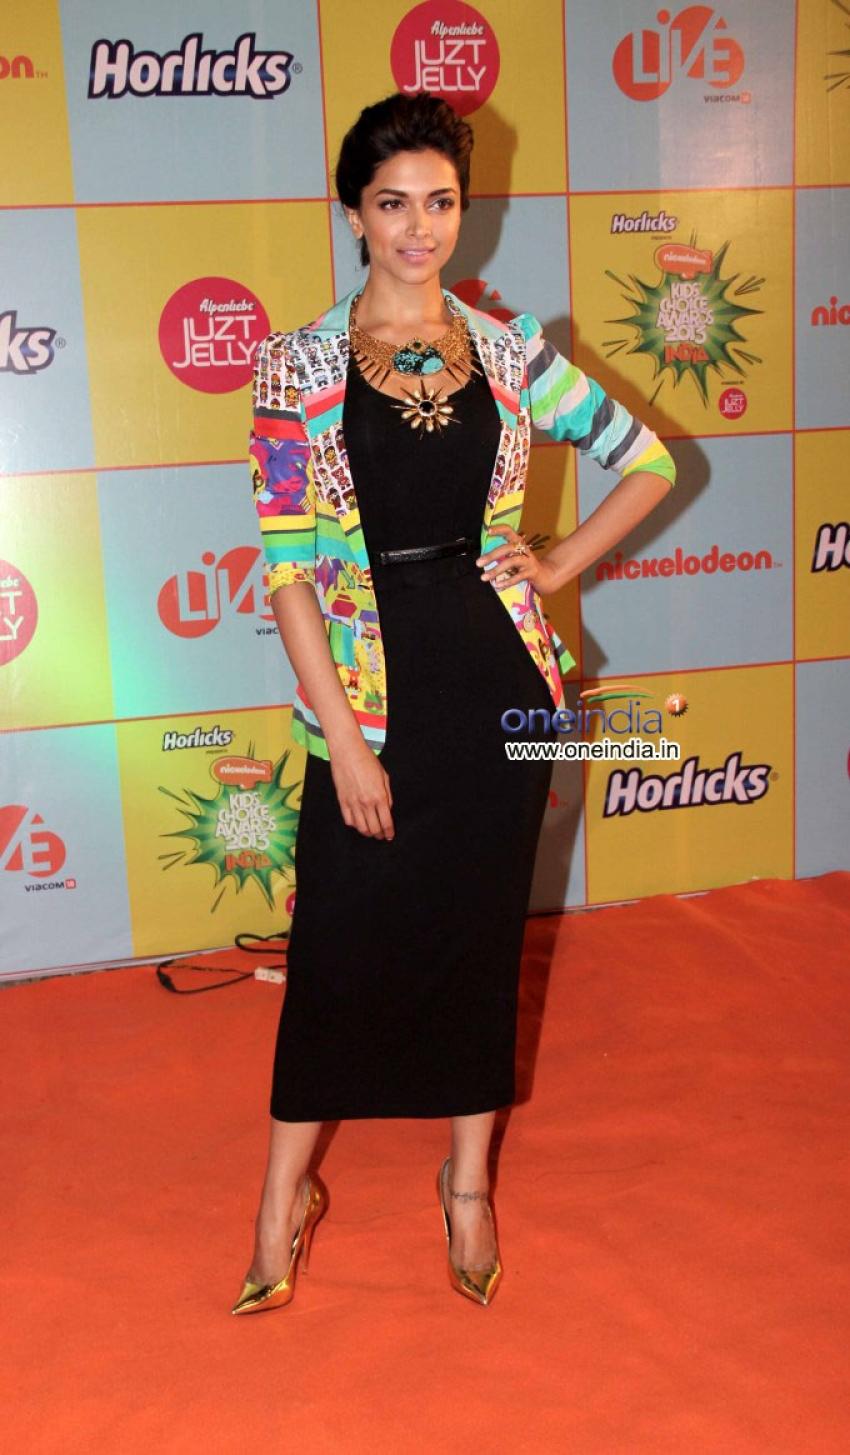 Nickelodeon Kids Choice Awards 2013 Photos